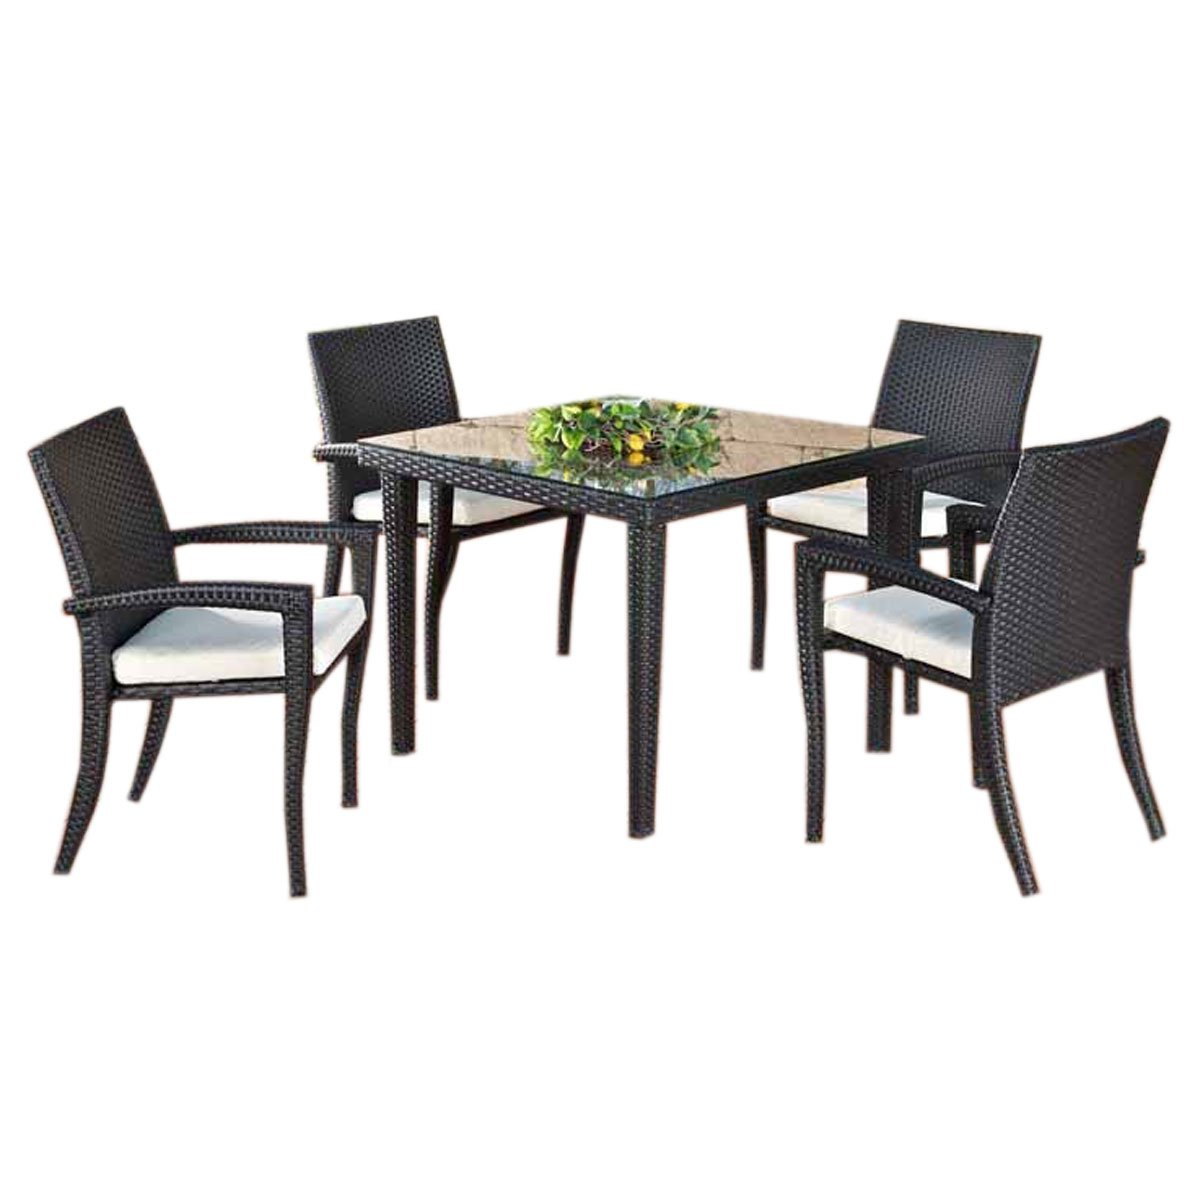 Conjunto de jard n bari mesa 90x90cm 4 sillas negro for Conjunto muebles jardin oferta